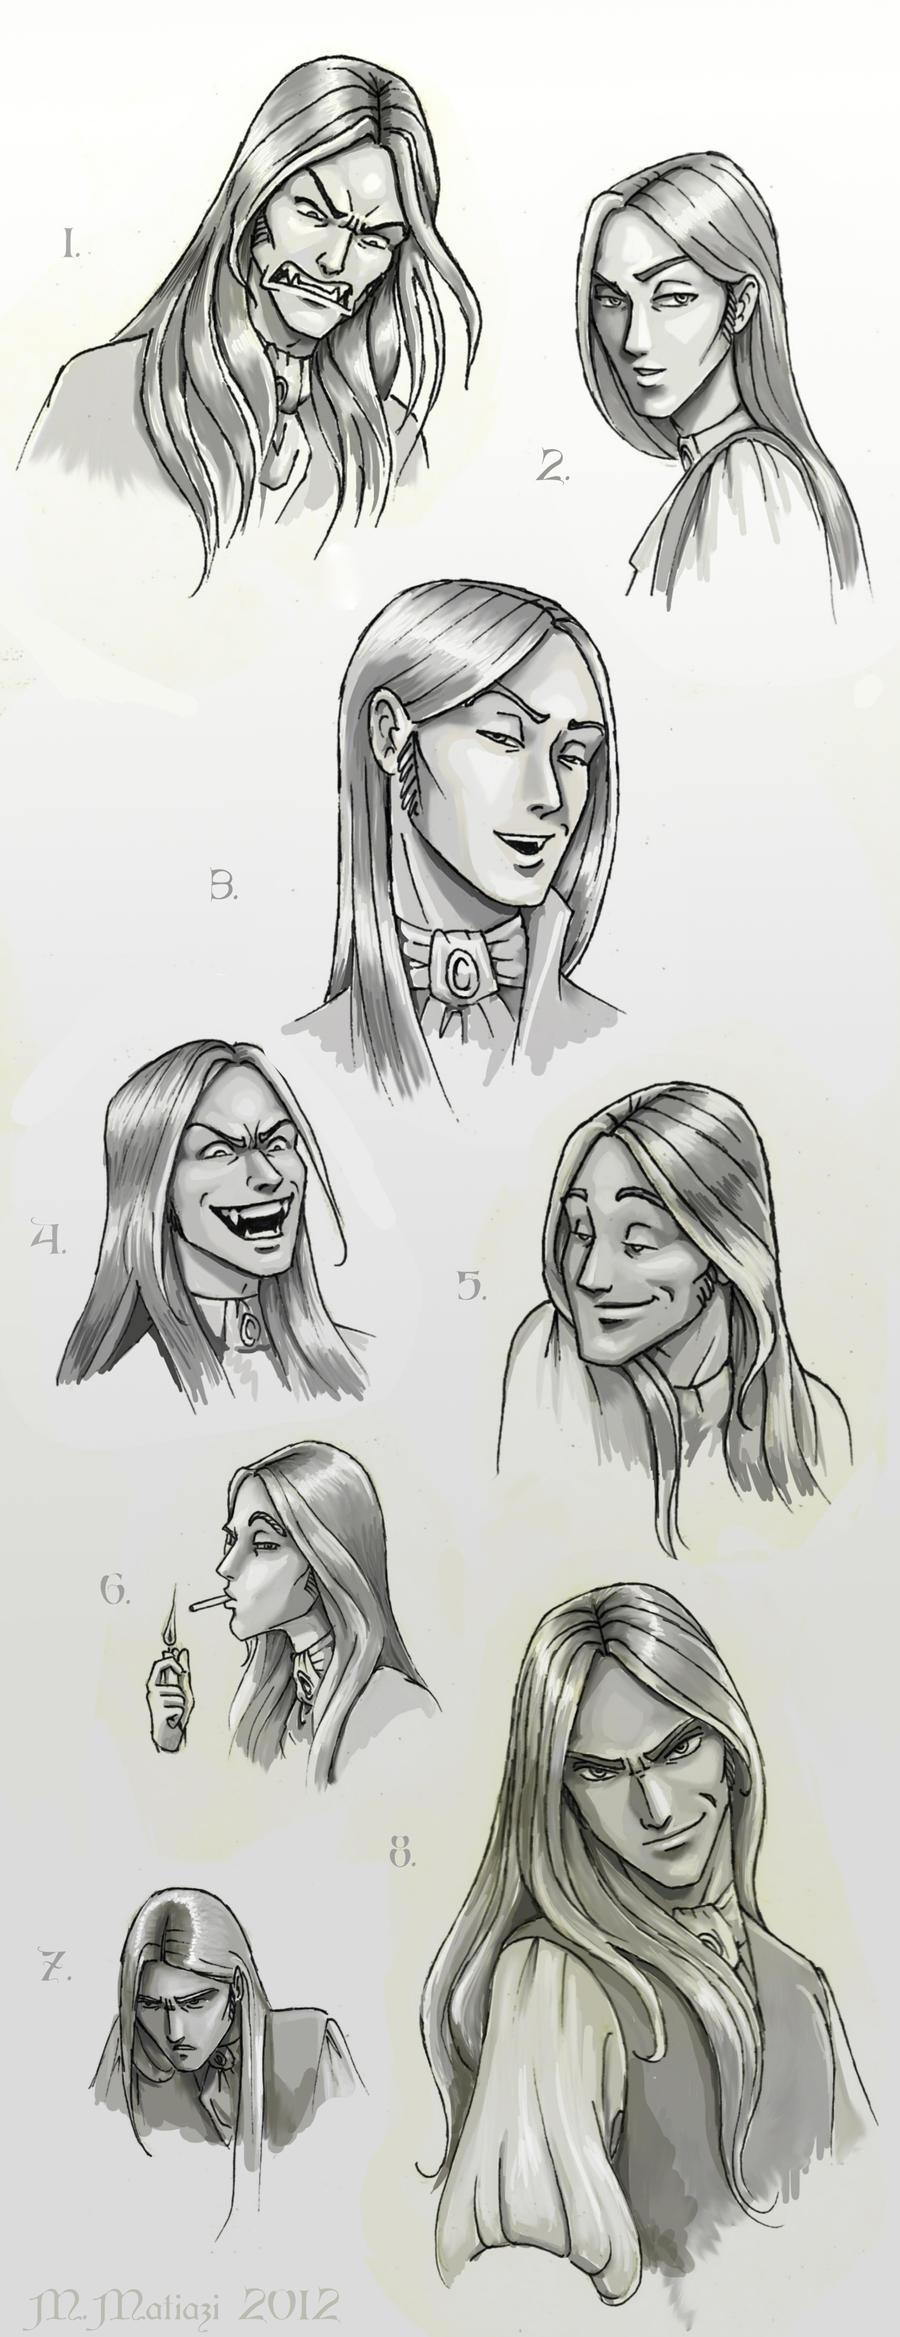 Portfólio M. Matiazi - Página 3 Jade__s_faces_by_matiazilustrando-d4ukvvc